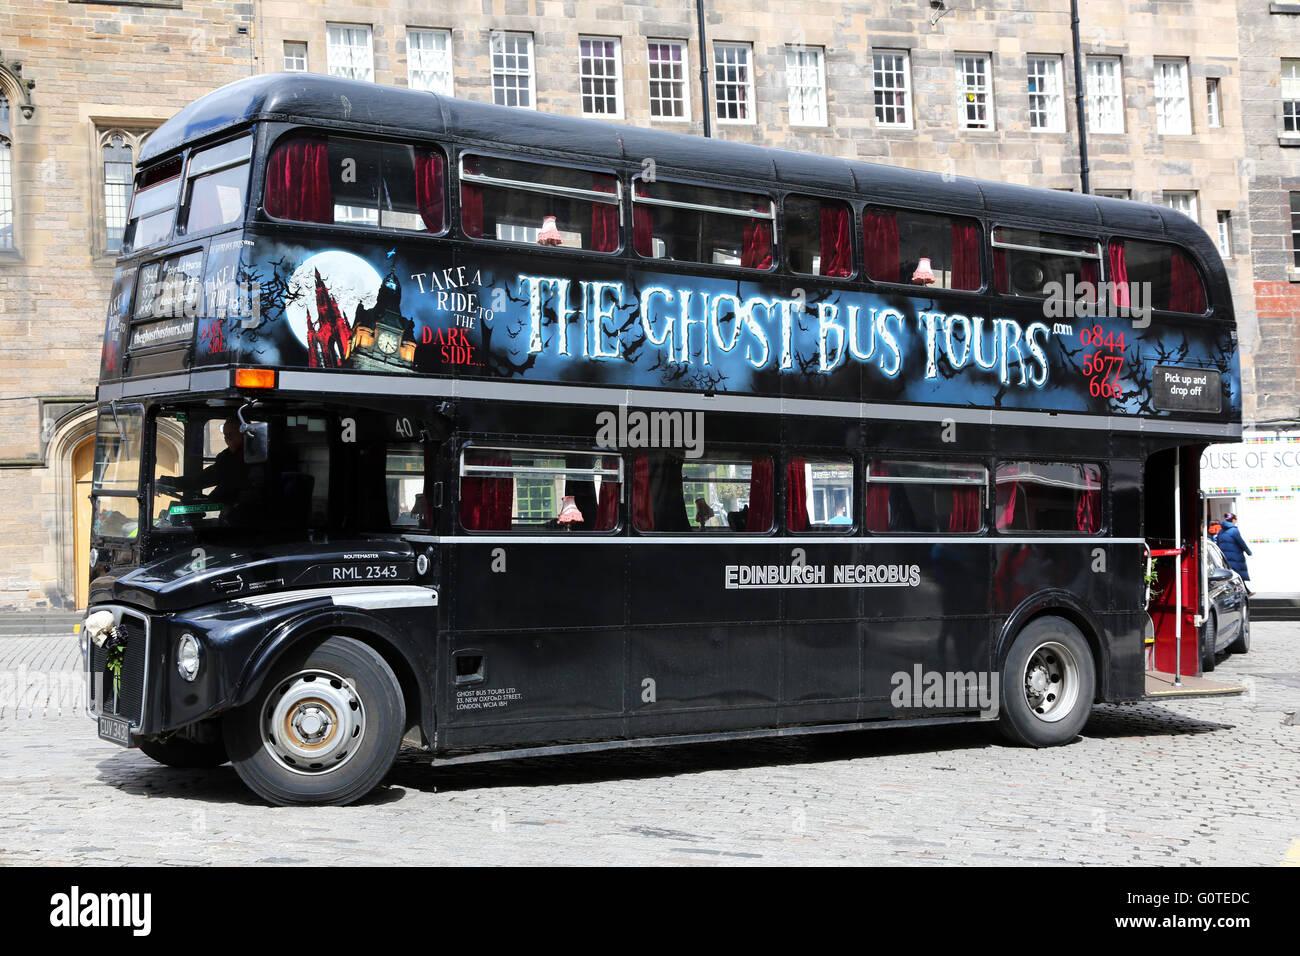 Black double decker Ghost Tours Bus in Edinburgh, Scotland, United Kingdom Stock Photo